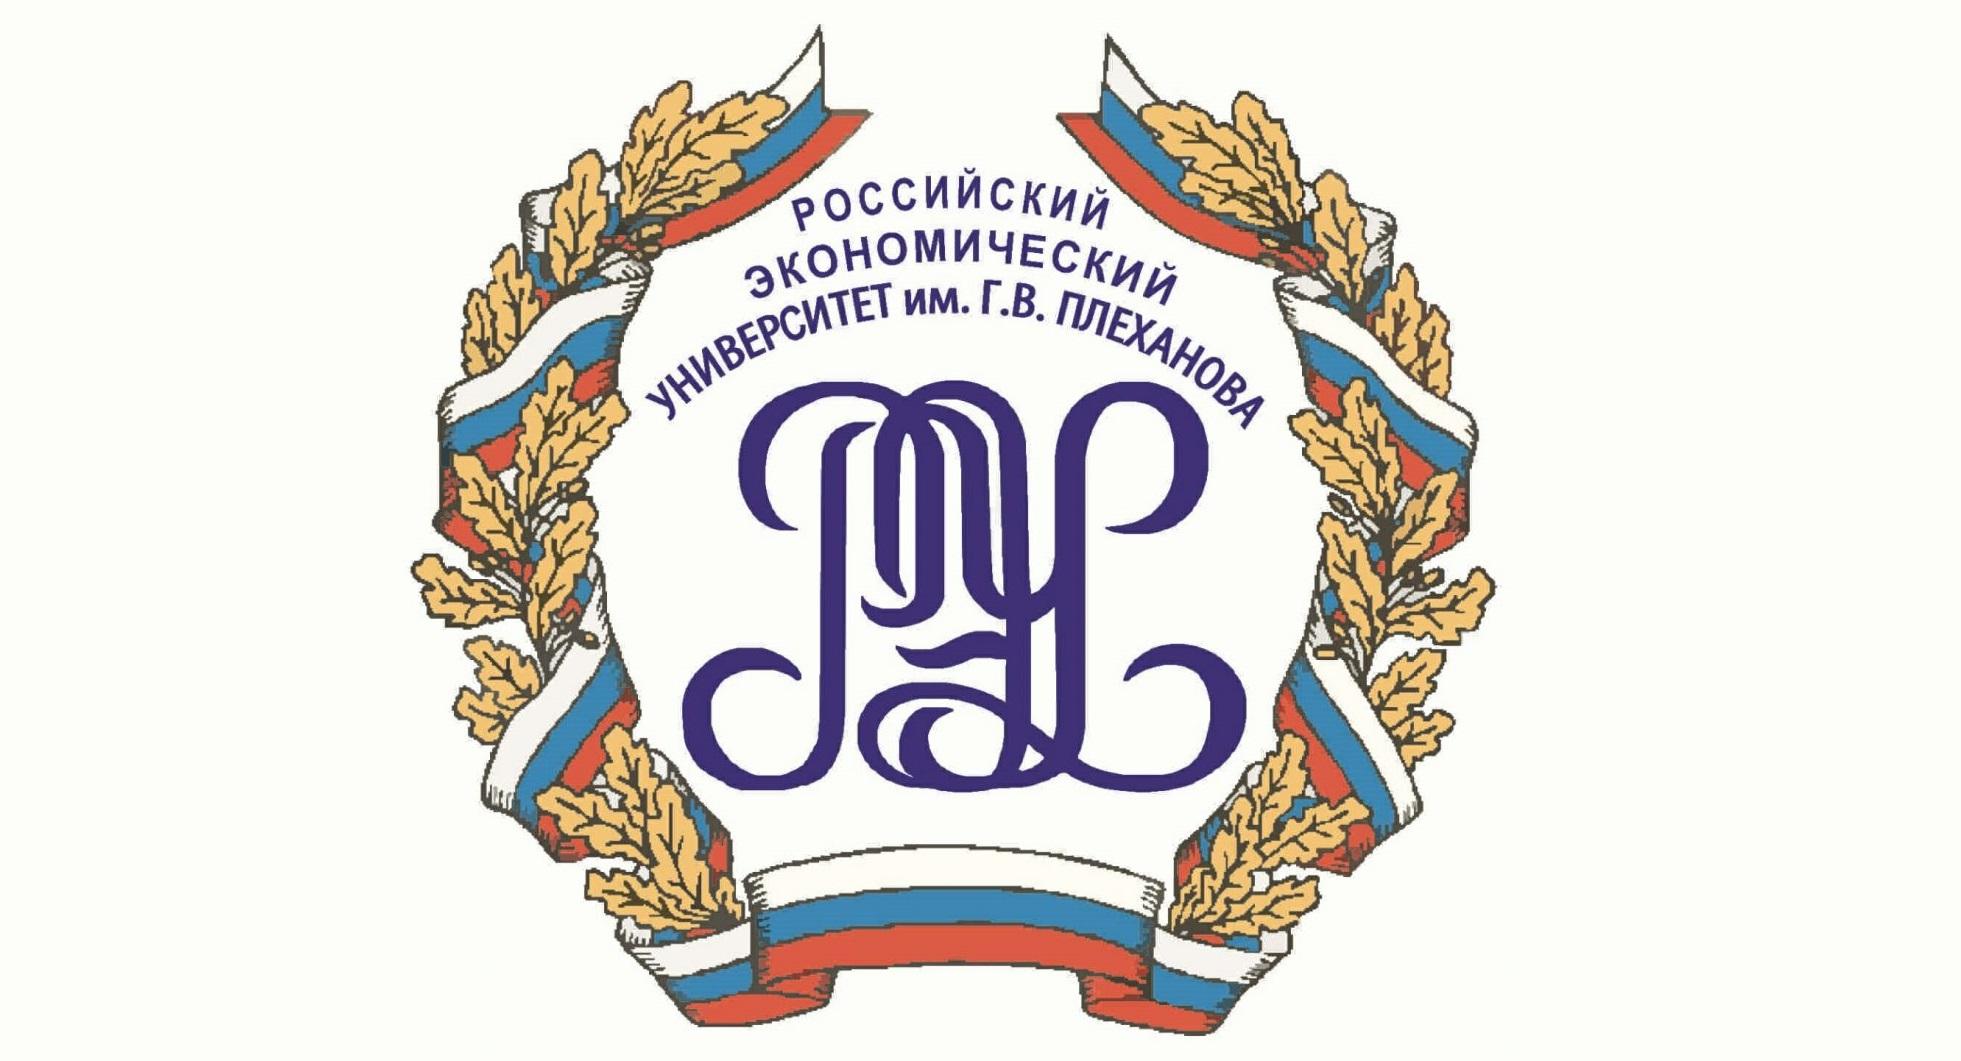 Армен Манукян РЭУ им. Плеханова